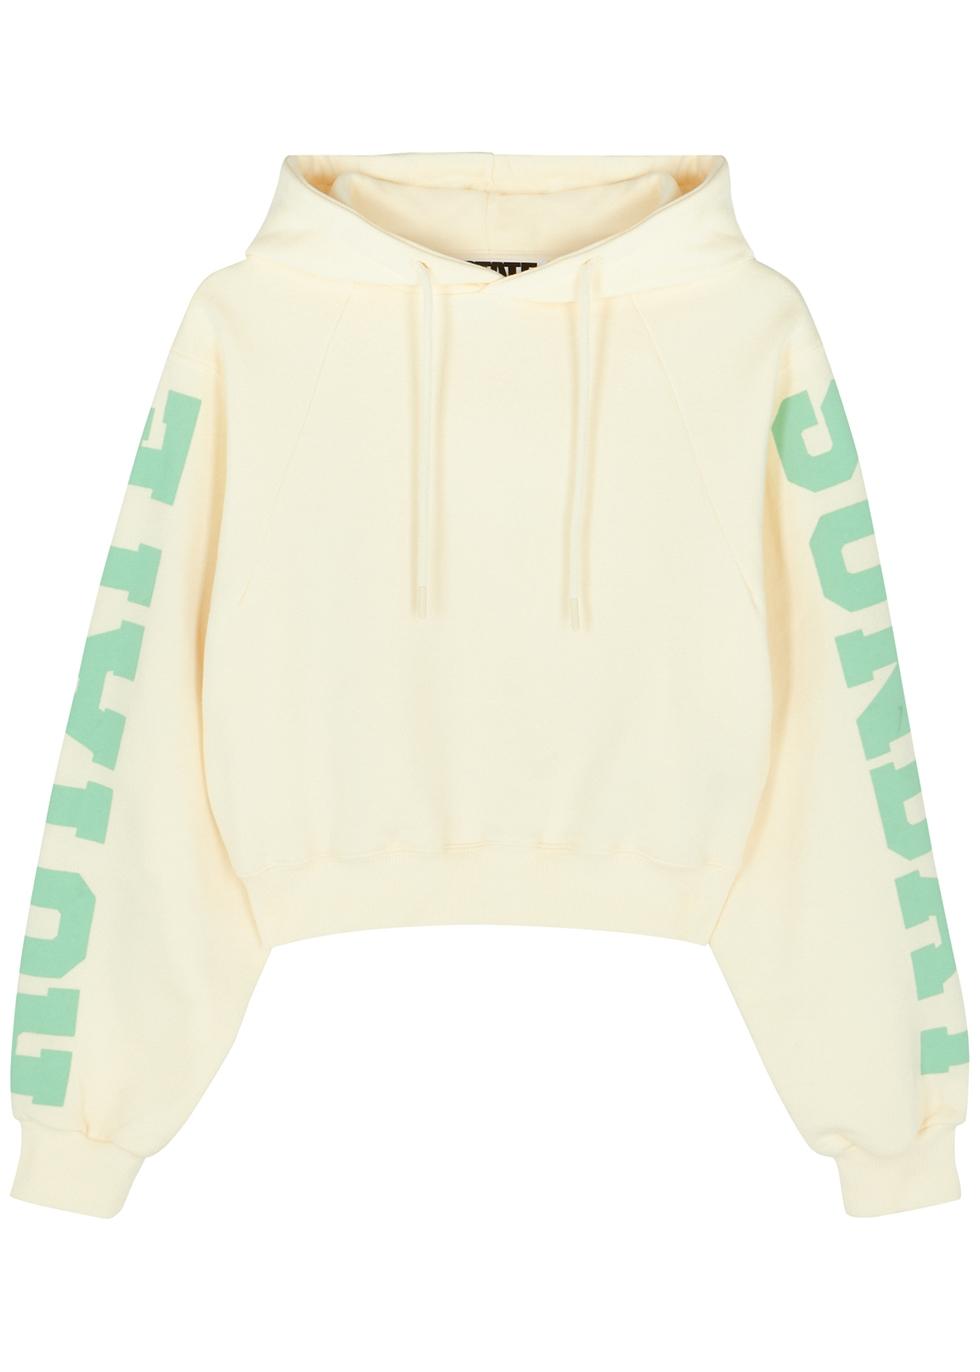 Viola cream hooded cotton sweatshirt